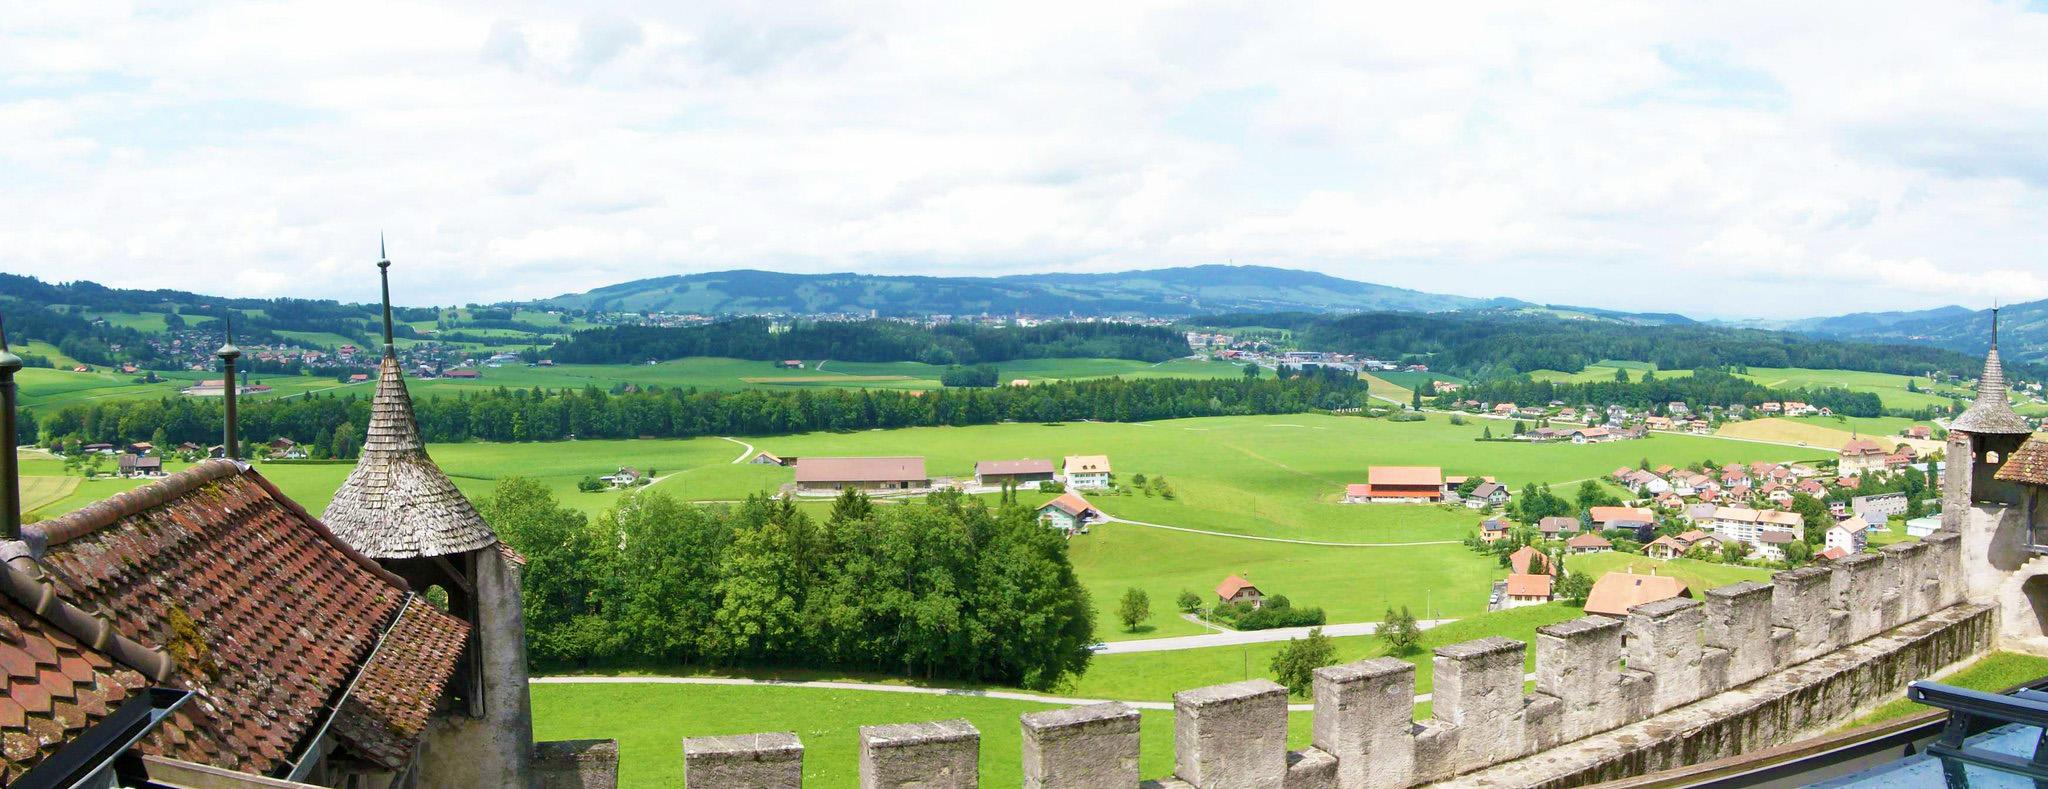 kt_2020_350_Keytours_excursions_Swisstours_gruyères_village4_2048_10